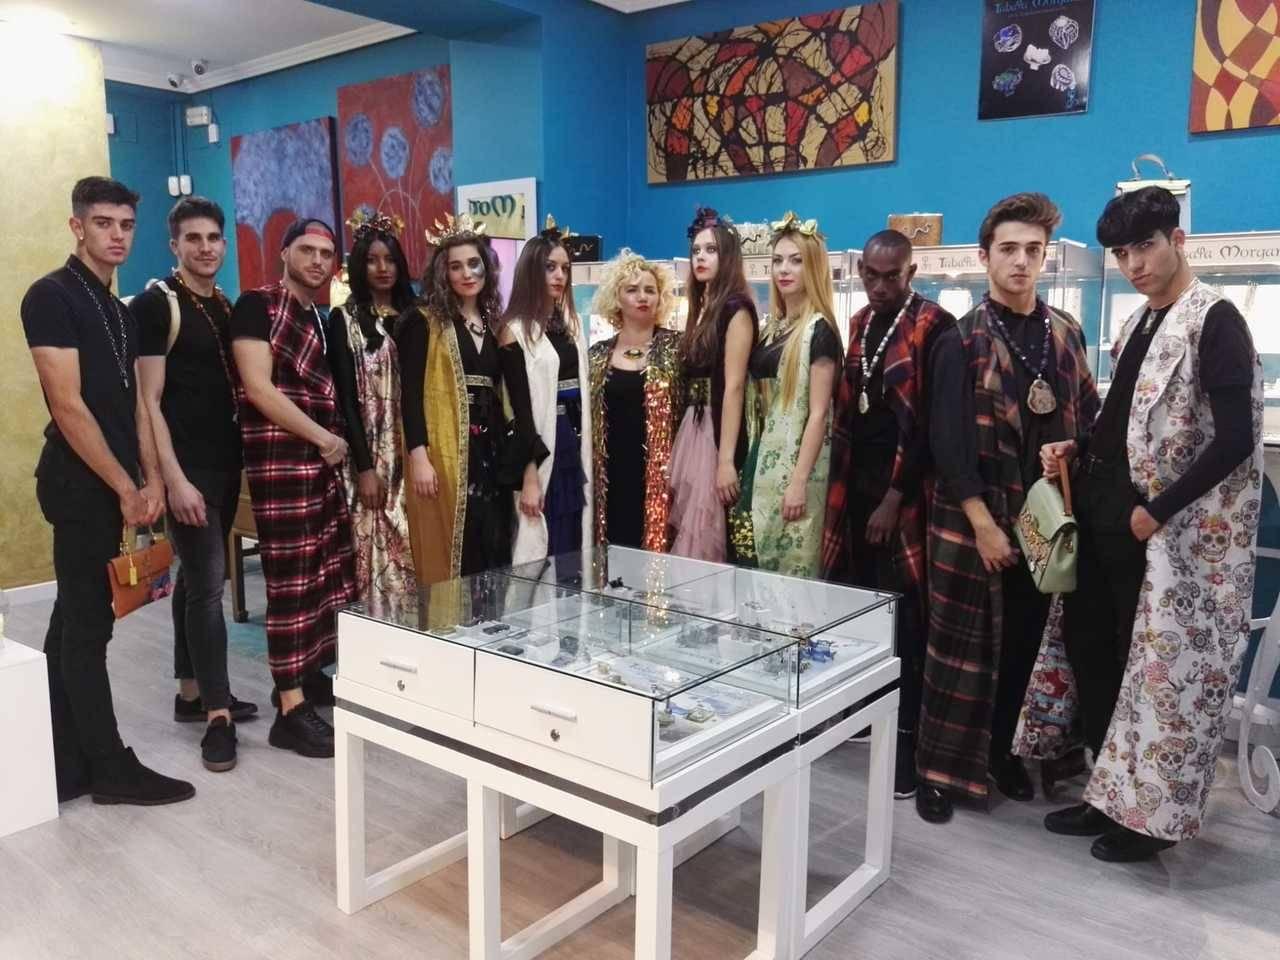 Aires étnicos en la nueva colección de Tabata Morgana: <em>Ikigai</em>